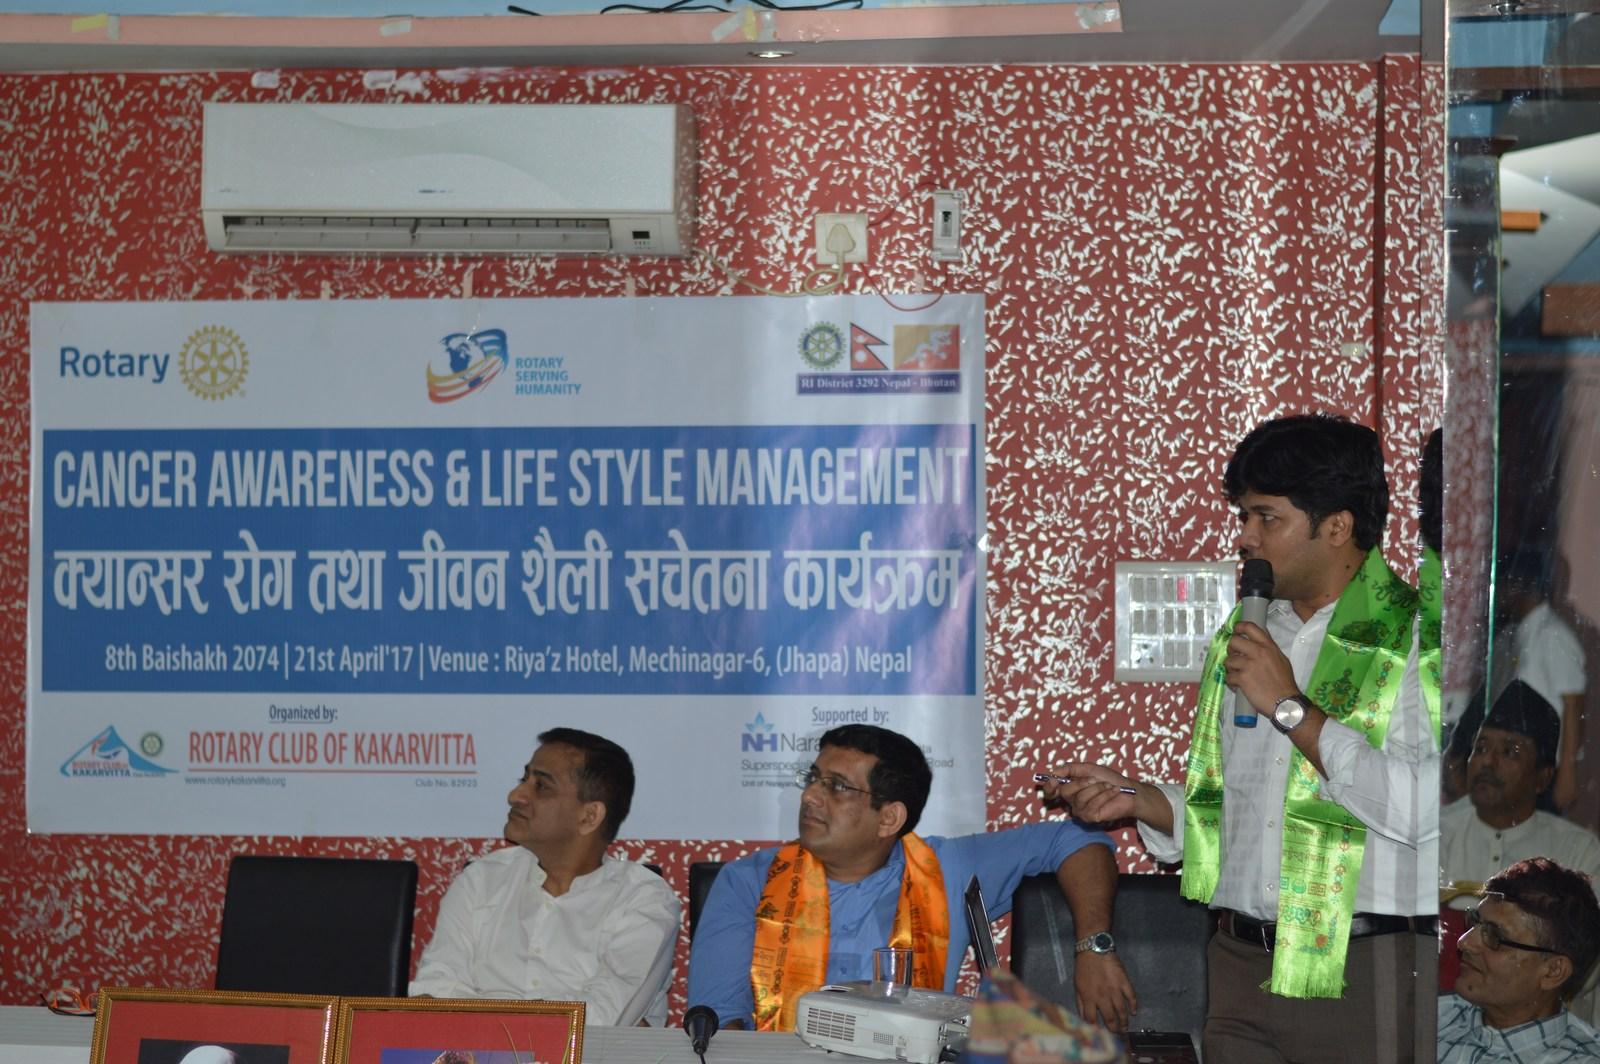 Cancer-Awareness-Life-Style-Management-Interaction-Program-2016-17-Rotary-Club-of-Kakarvitta-84